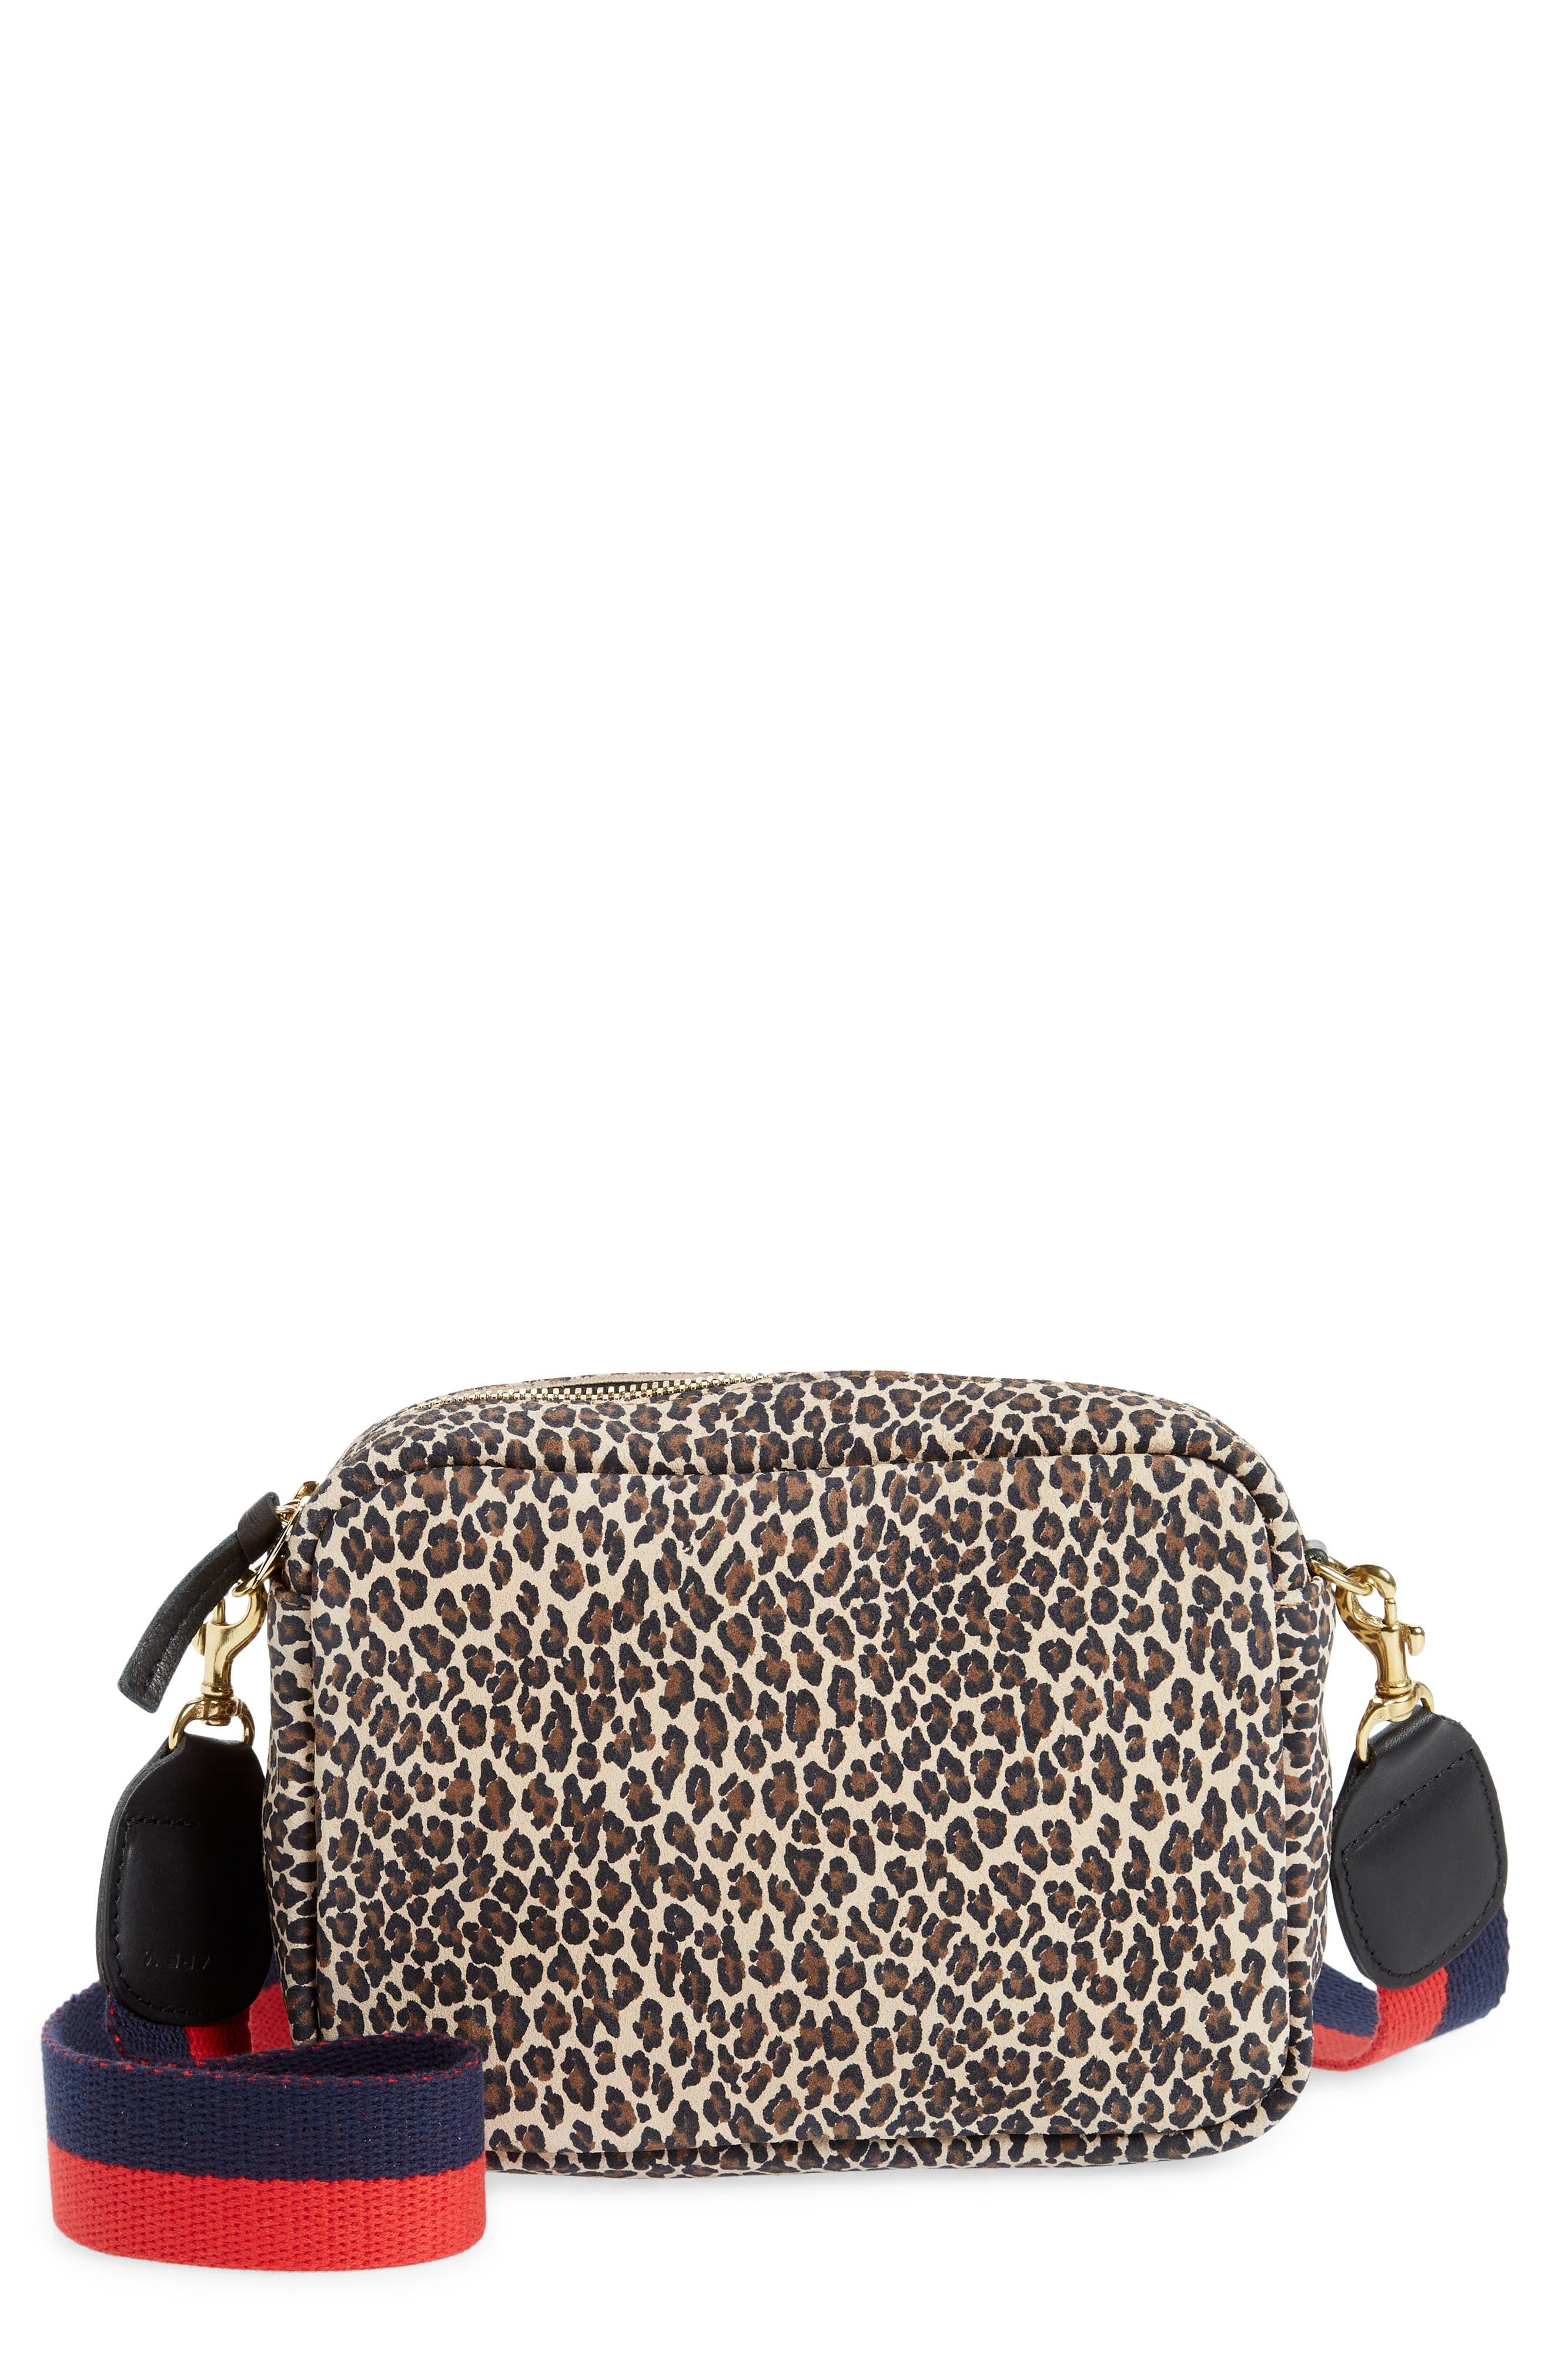 Midi Sac Leopard Print Leather Crossbody Bag